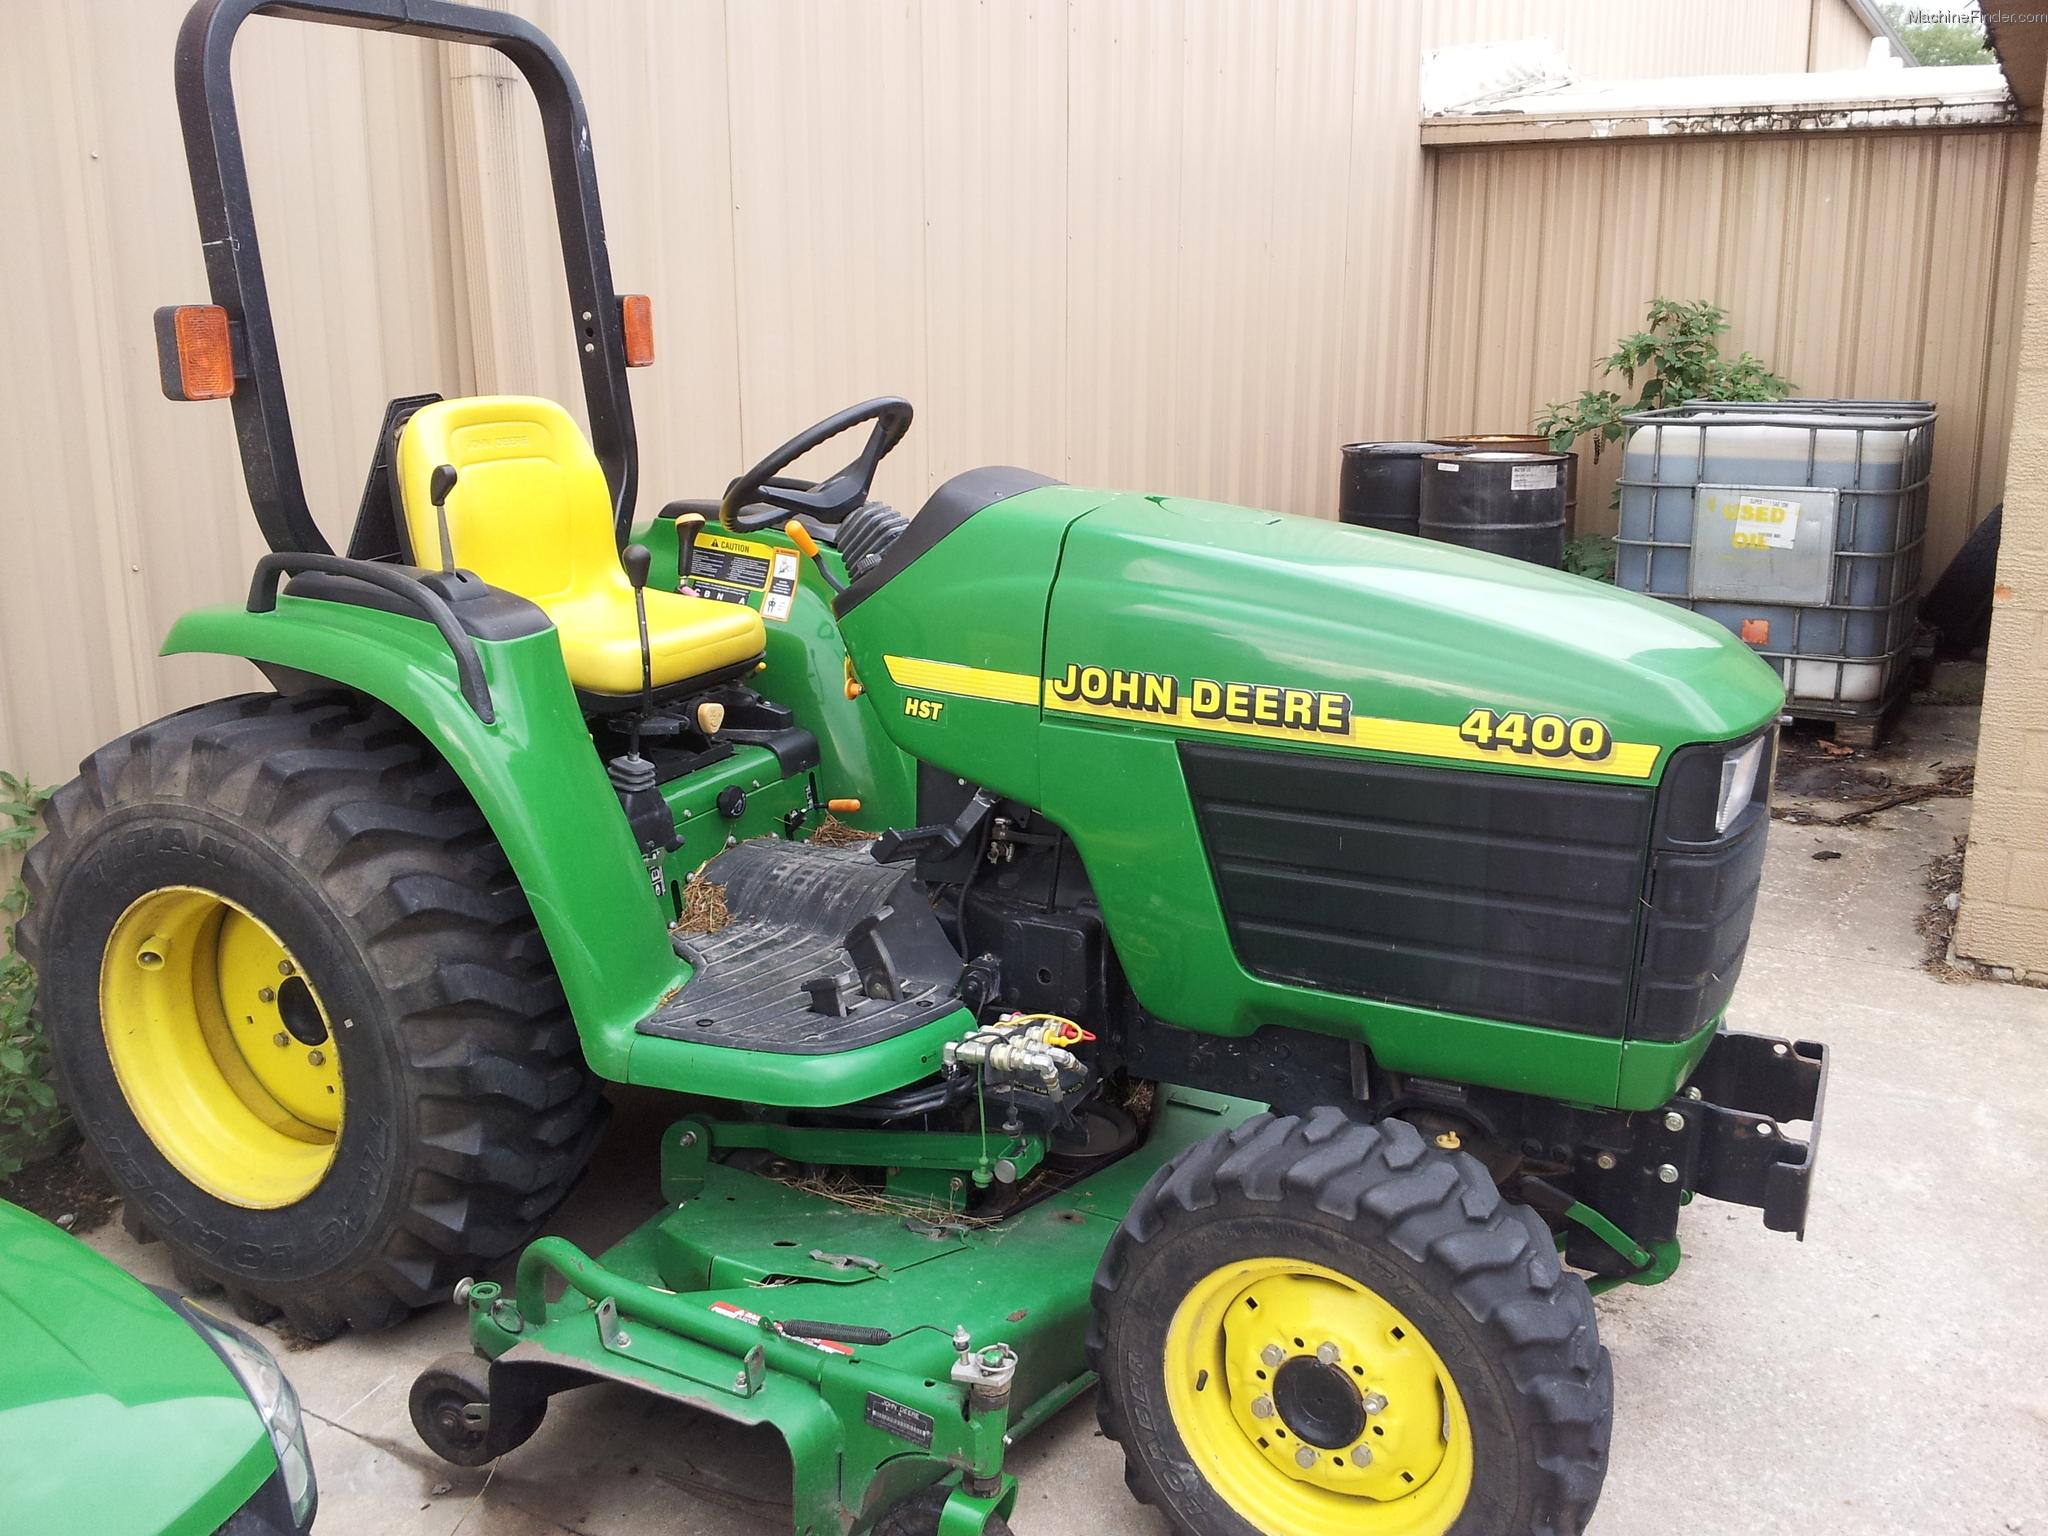 2001 John Deere 4400 Tractors - Compact (1-40hp.) - John ...